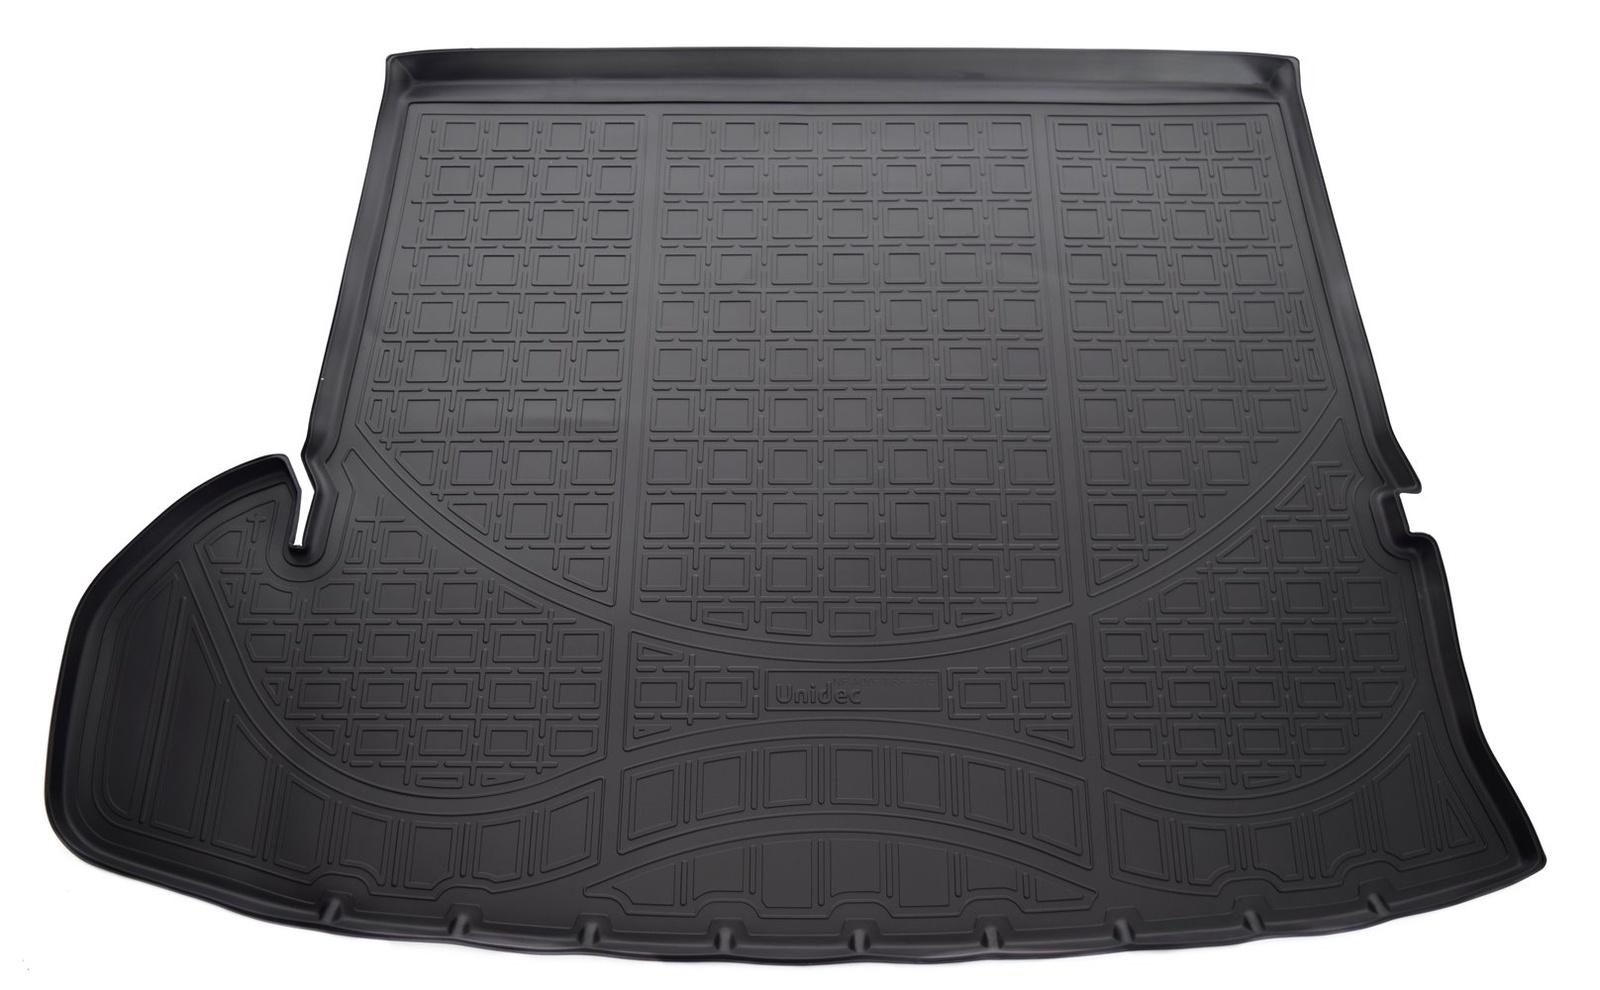 Коврик багажника для Toyota Highlander (2014) (7 мест) original soocoo ps2 1 axis adjustable gryo stabiliser compatible with all sprots action camera and smart phone